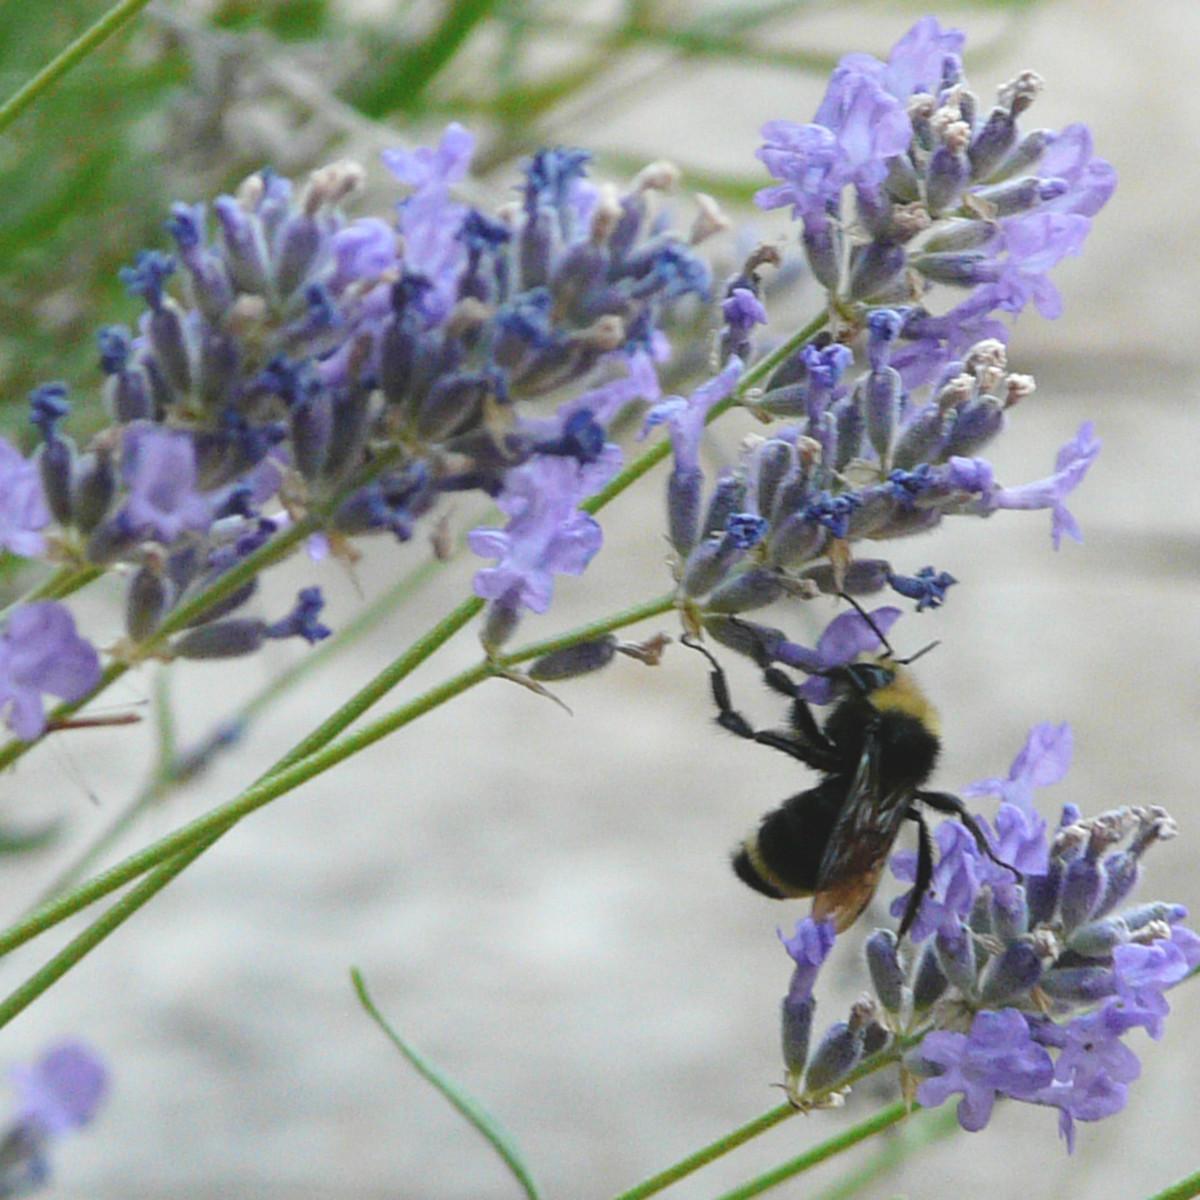 Wild Bee on Lavender